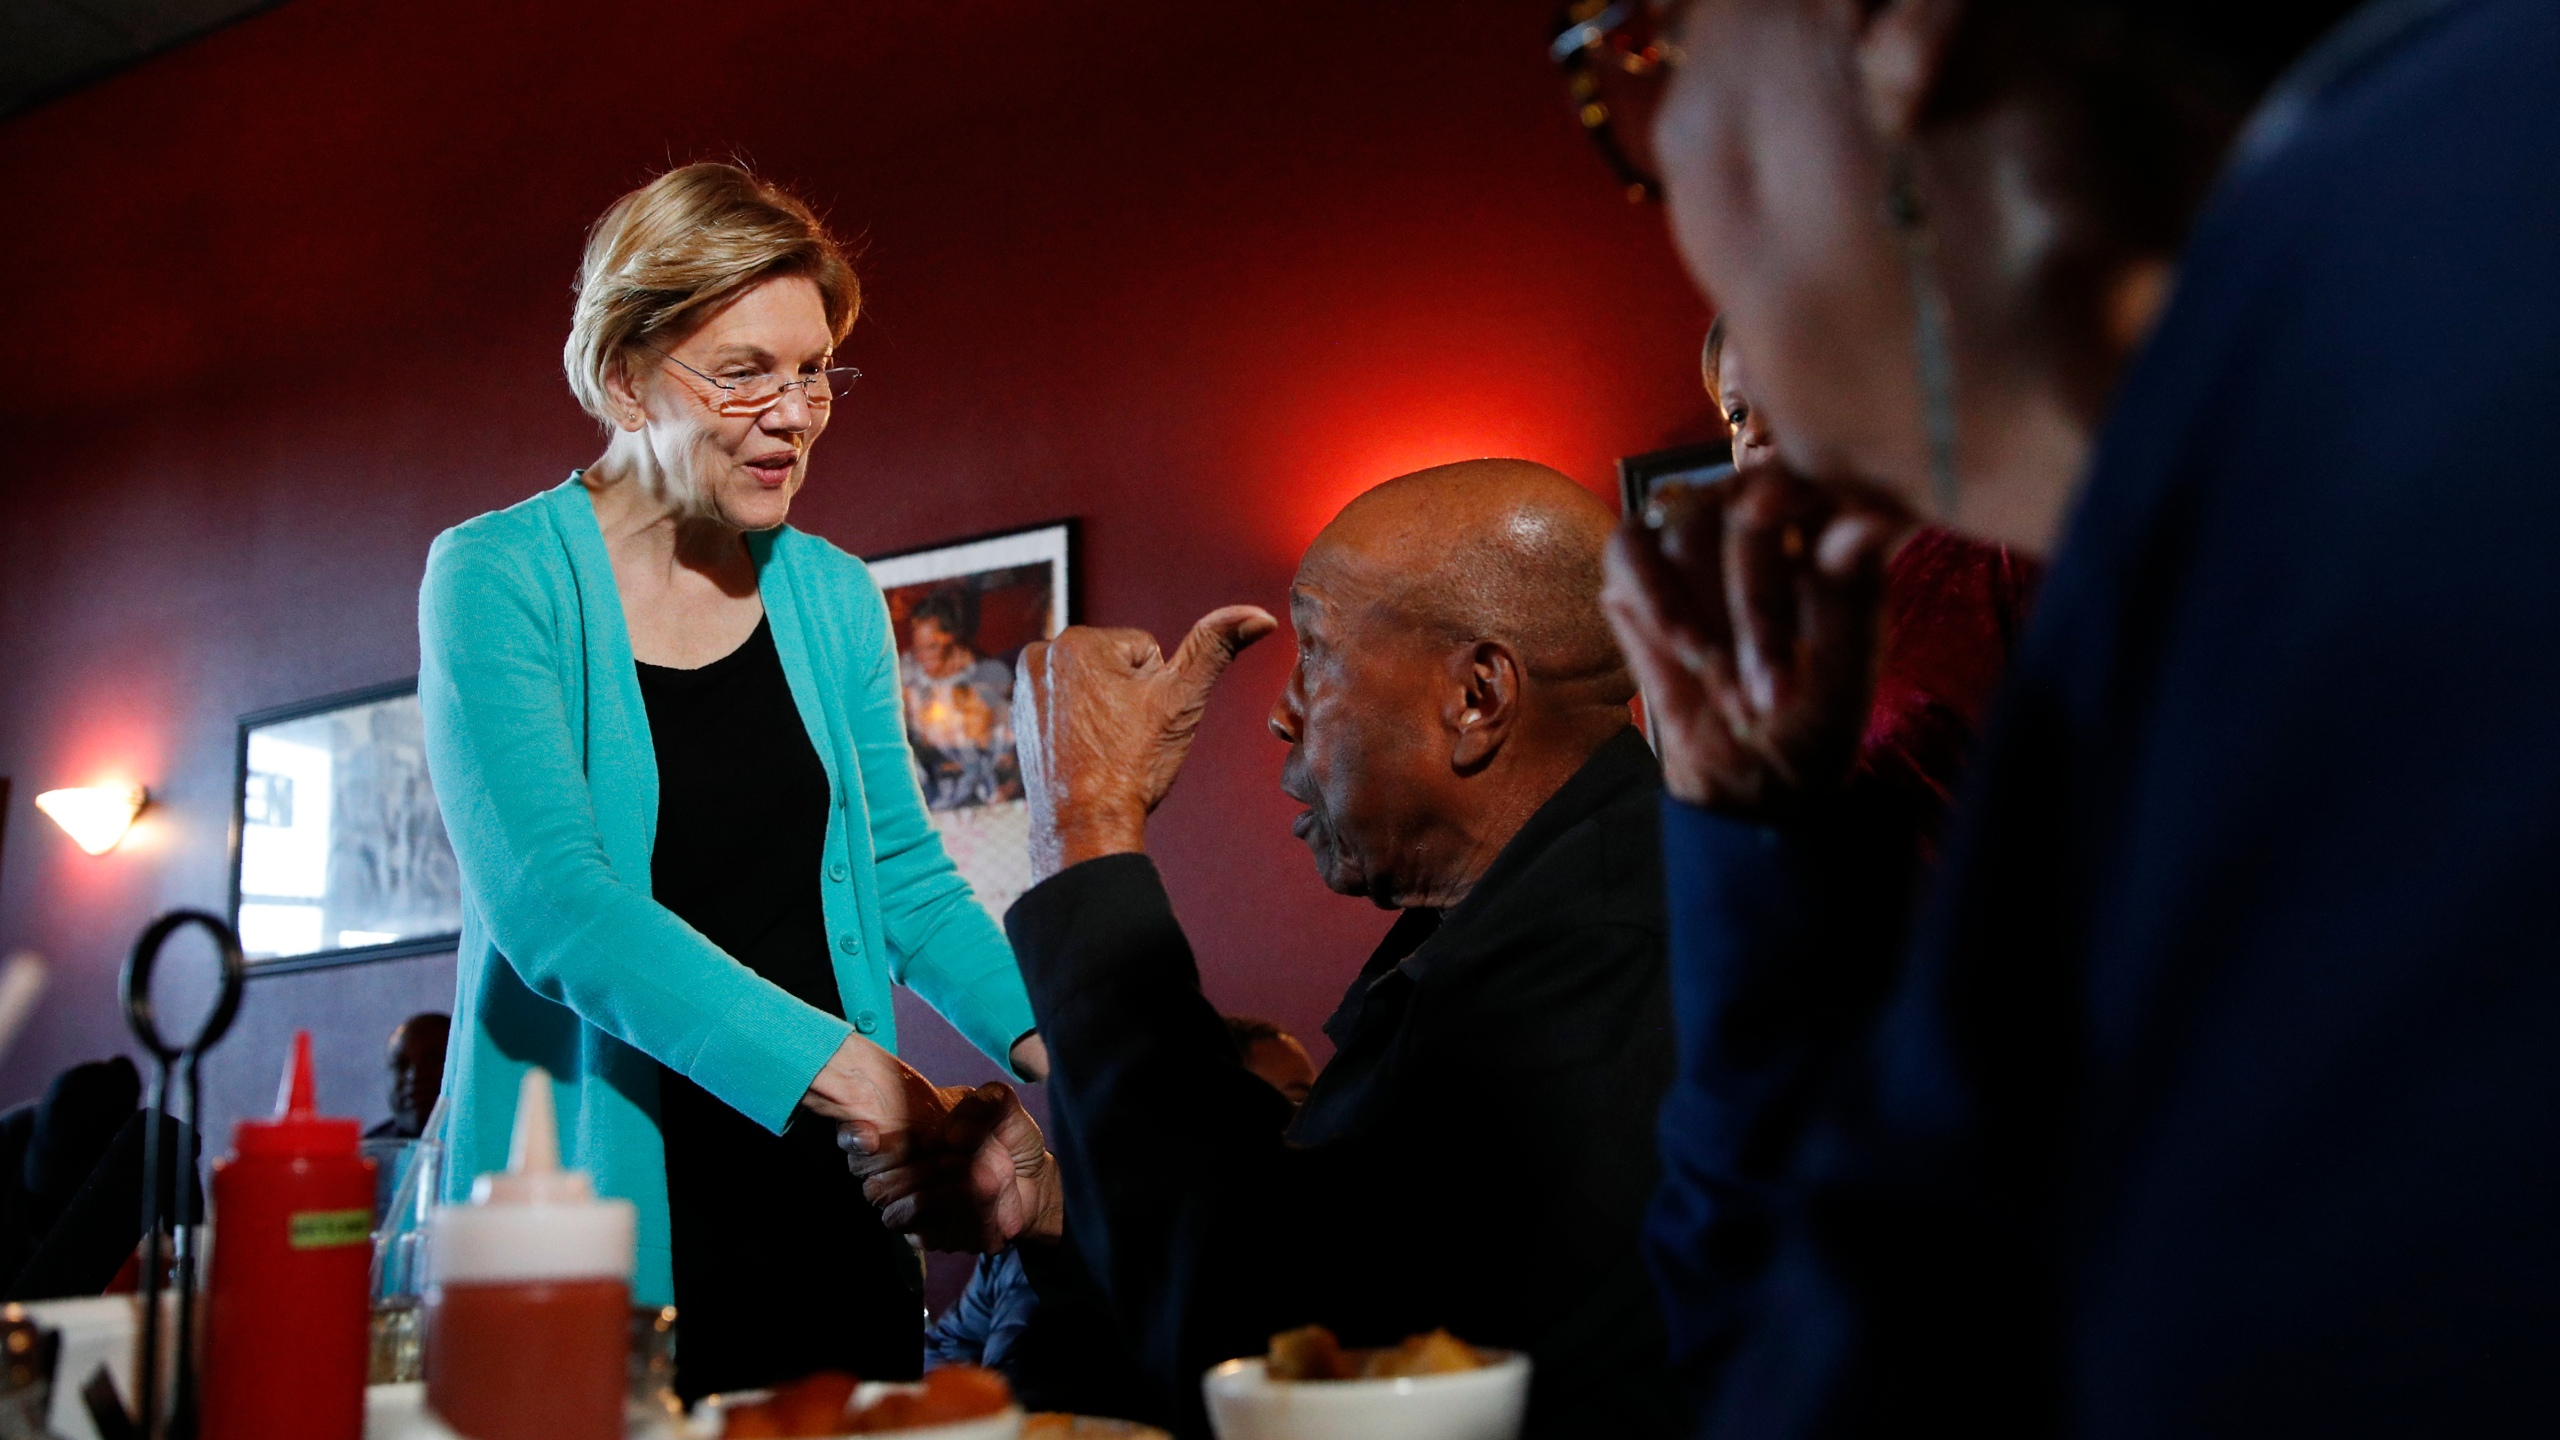 Bill Mamgum, Shirley Mamgum, Elizabeth Warren